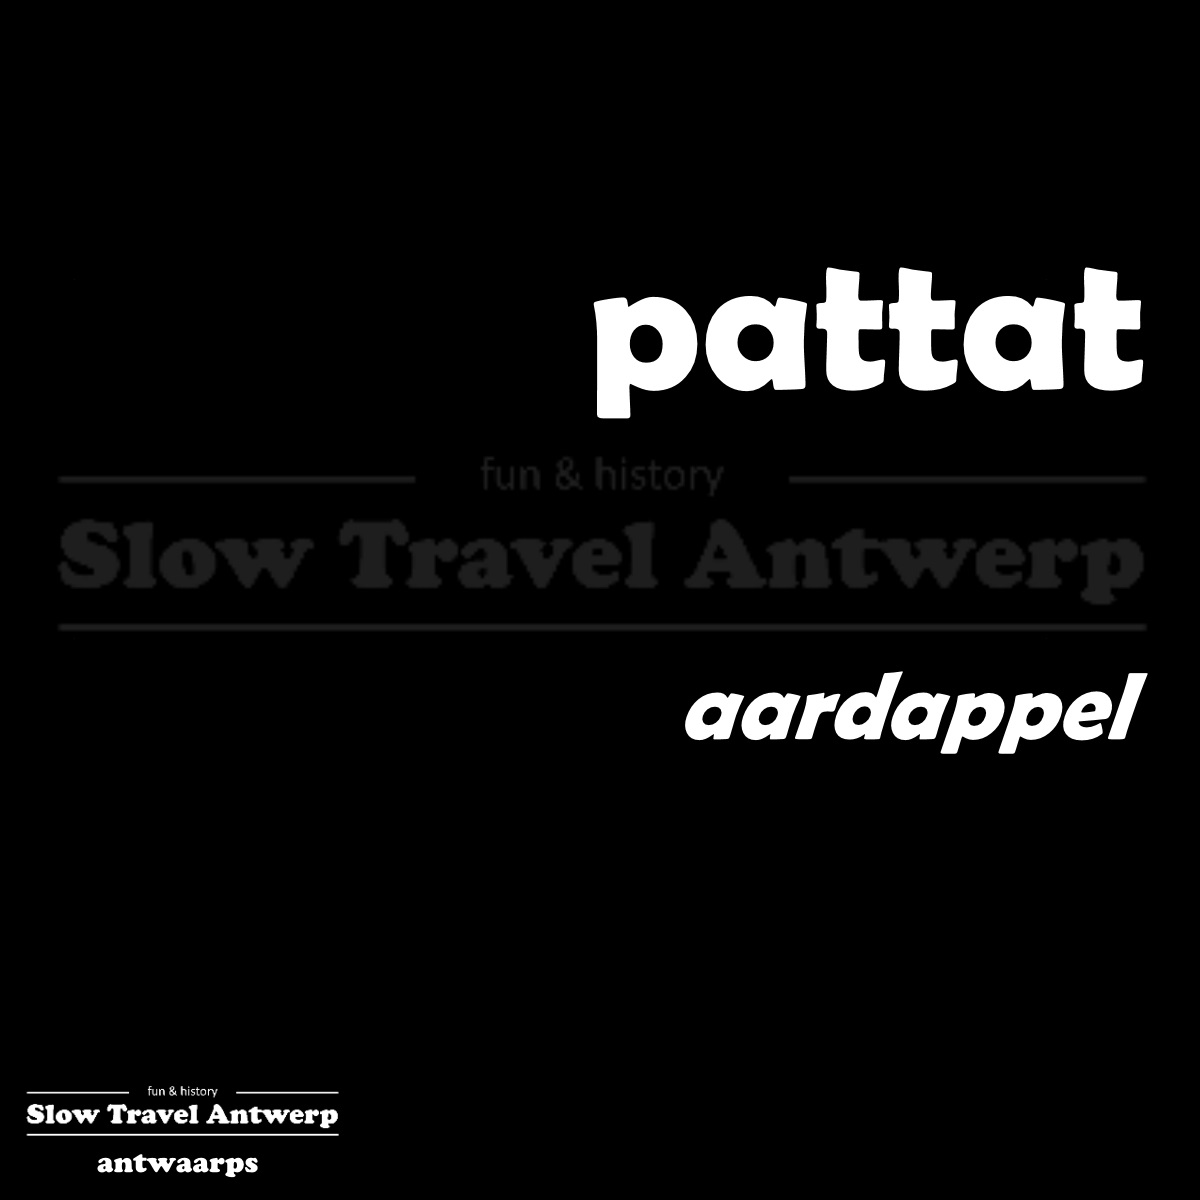 pattat – aardappel – potato